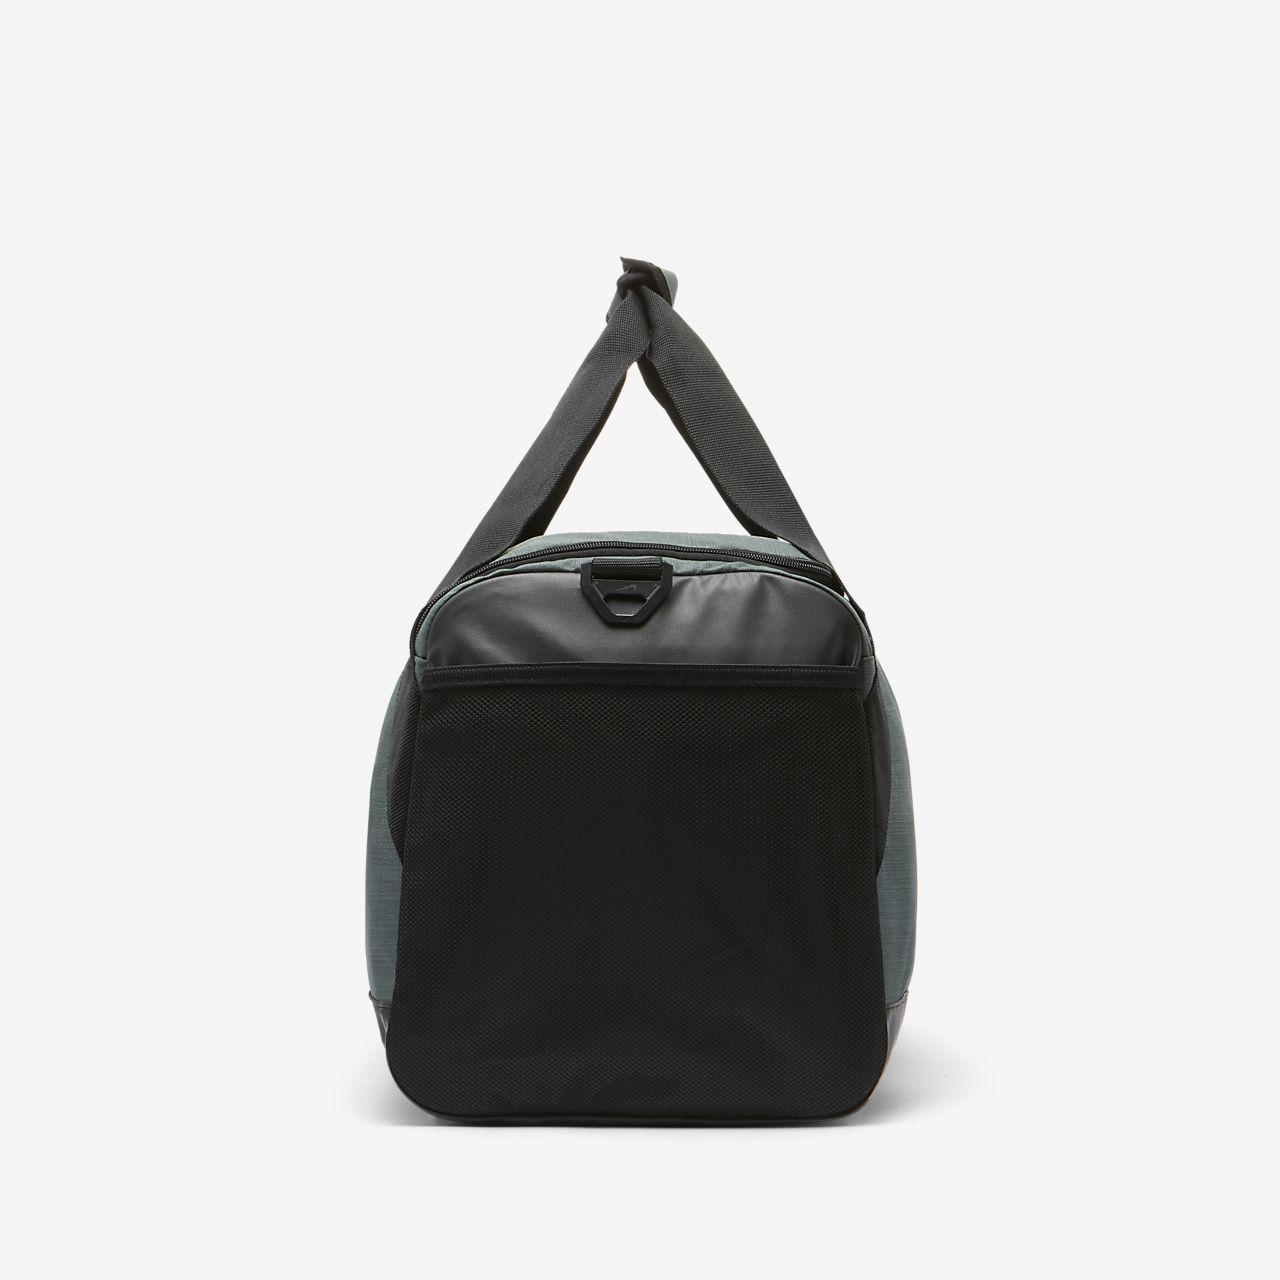 e1e5d93a99cb Nike Sportswear Brasilia (Medium) Training Duffel Bag. Nike.com AU